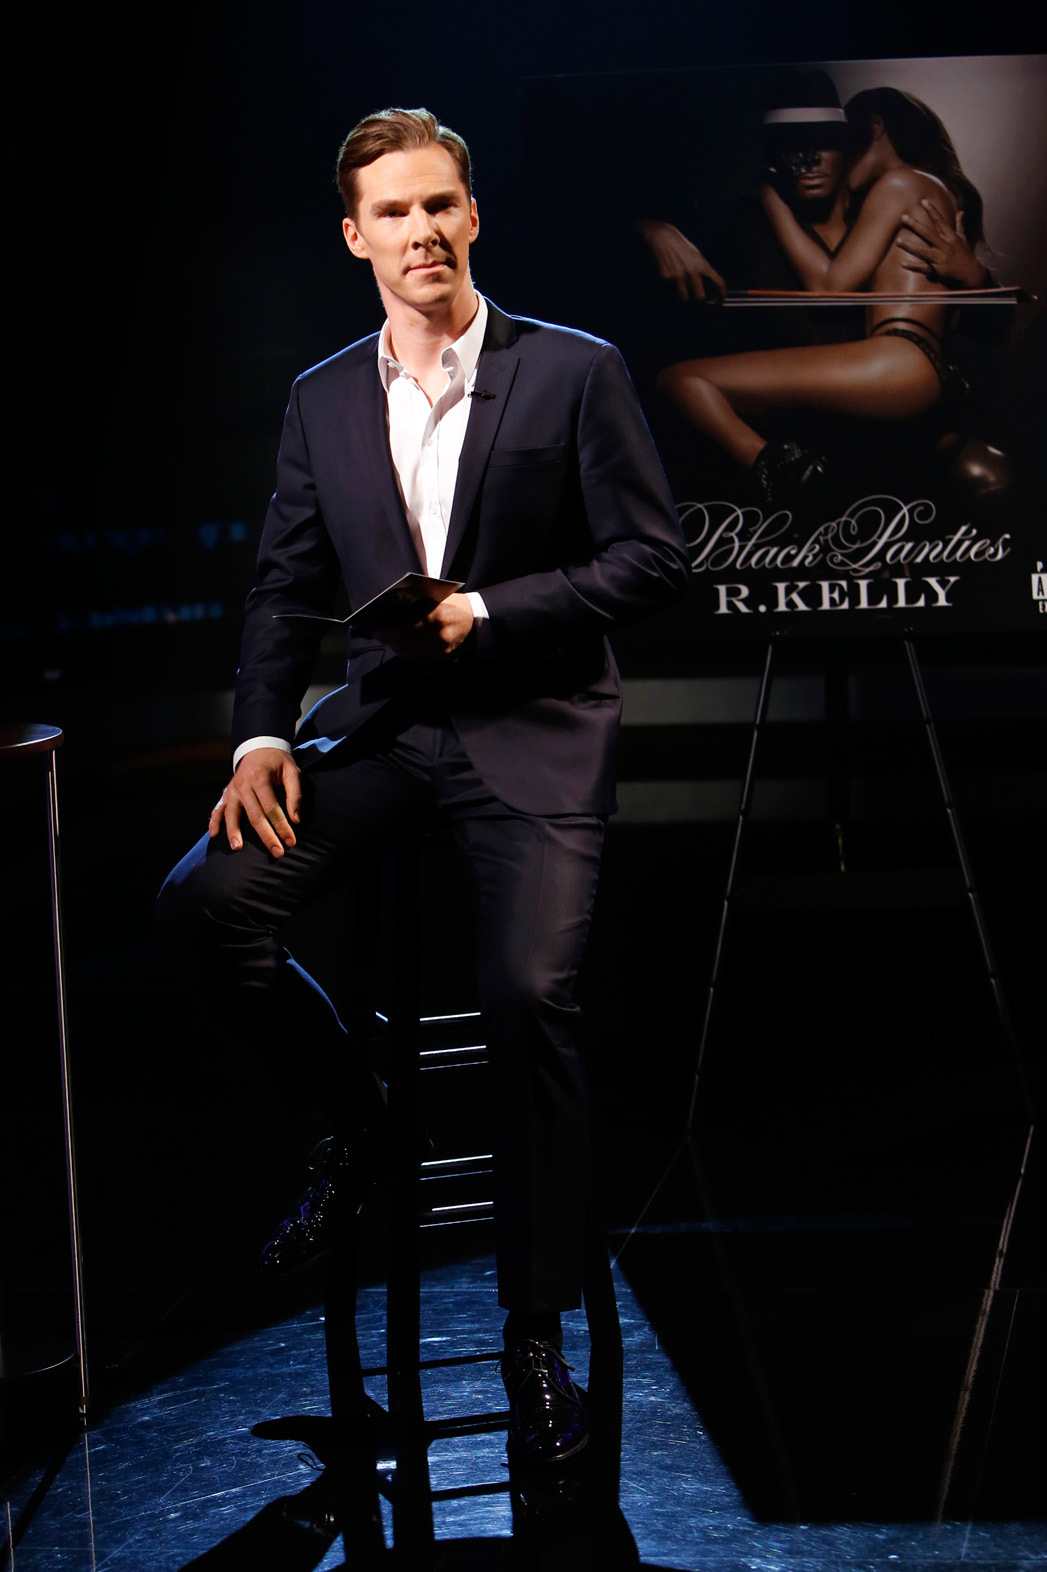 Benedict Cumberbatch Jimmy Kimmel Live - P 2013